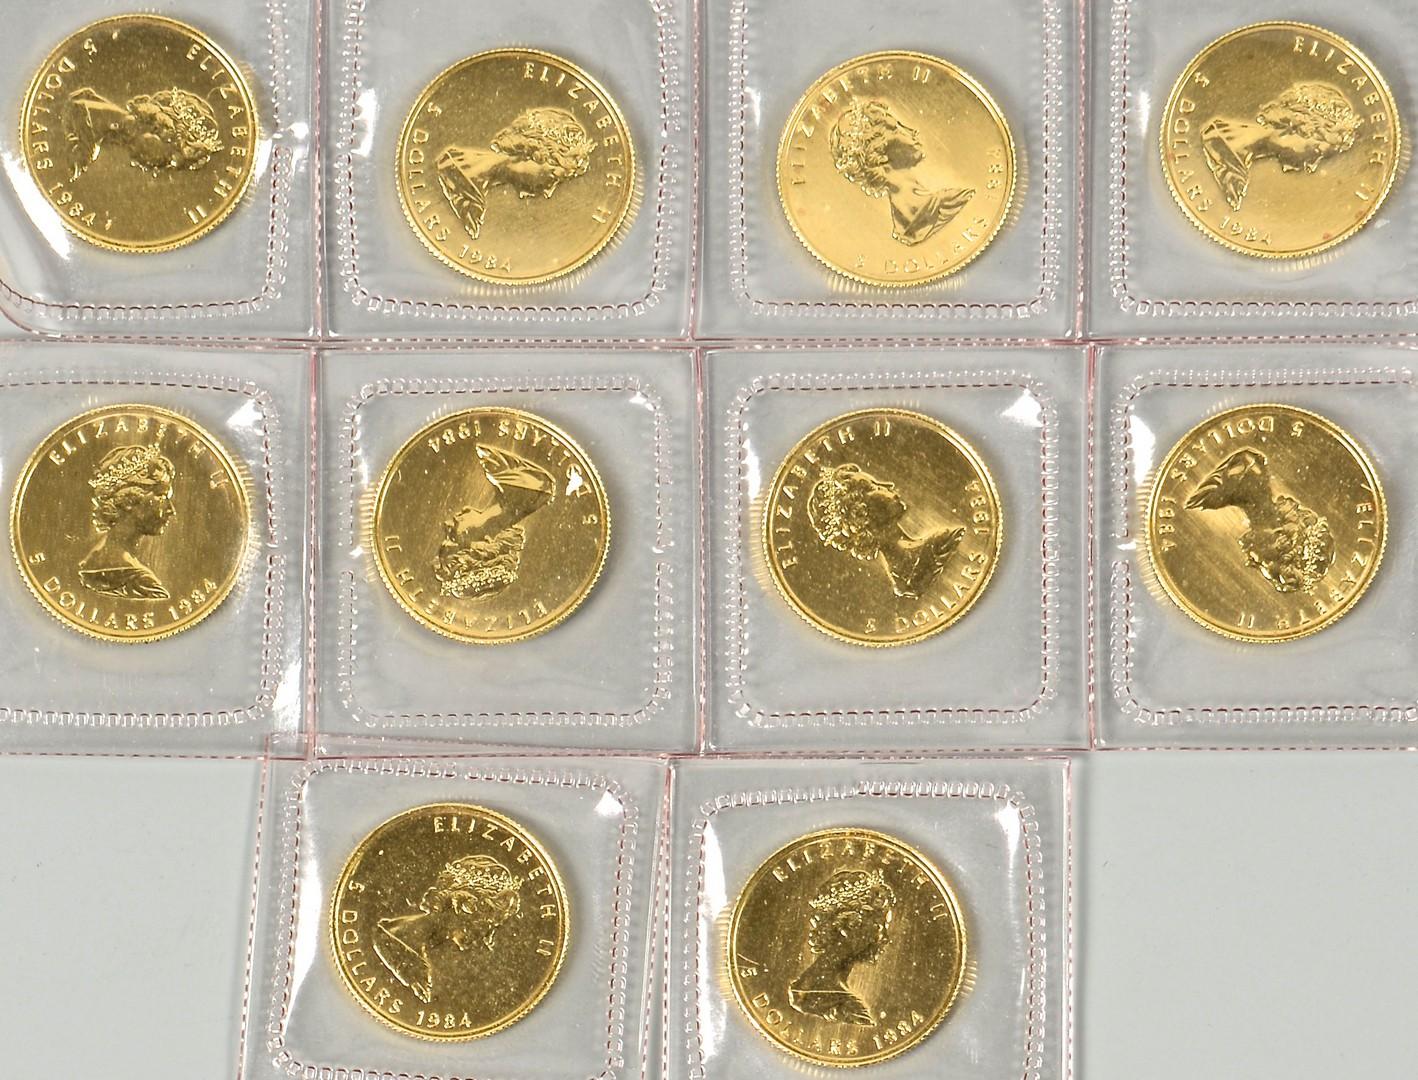 Lot 863: 10 Canadian Maple Leaf 1/10 24K Coins